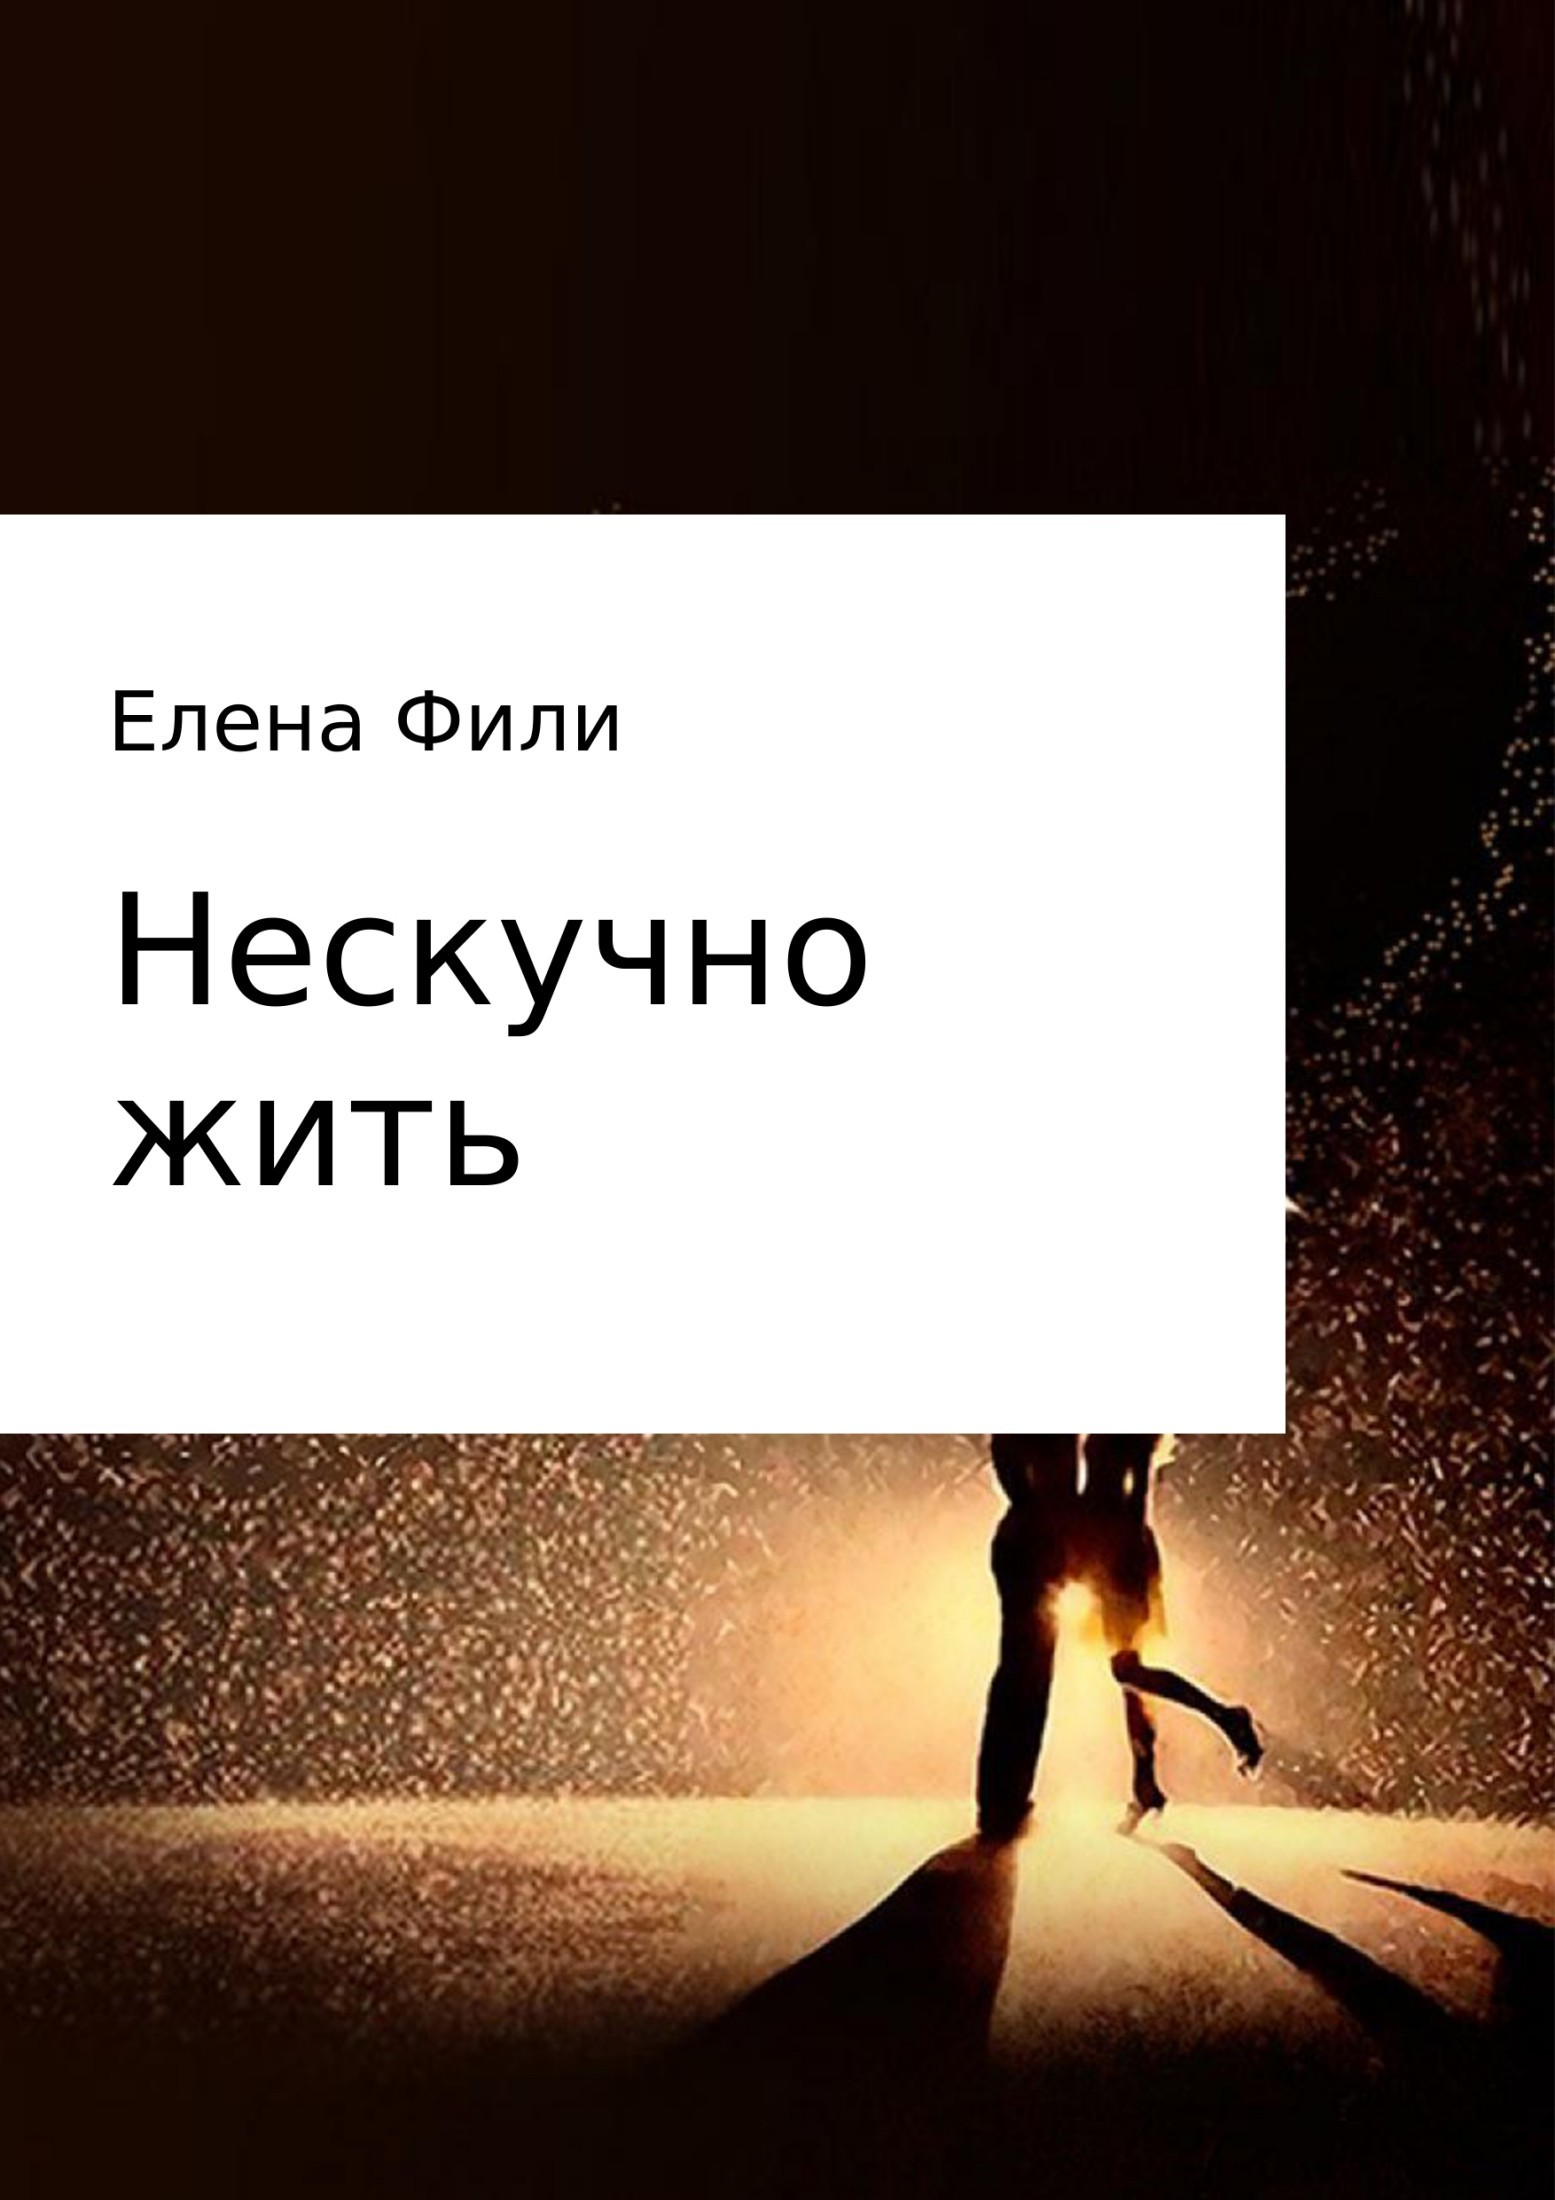 Елена Фили бесплатно